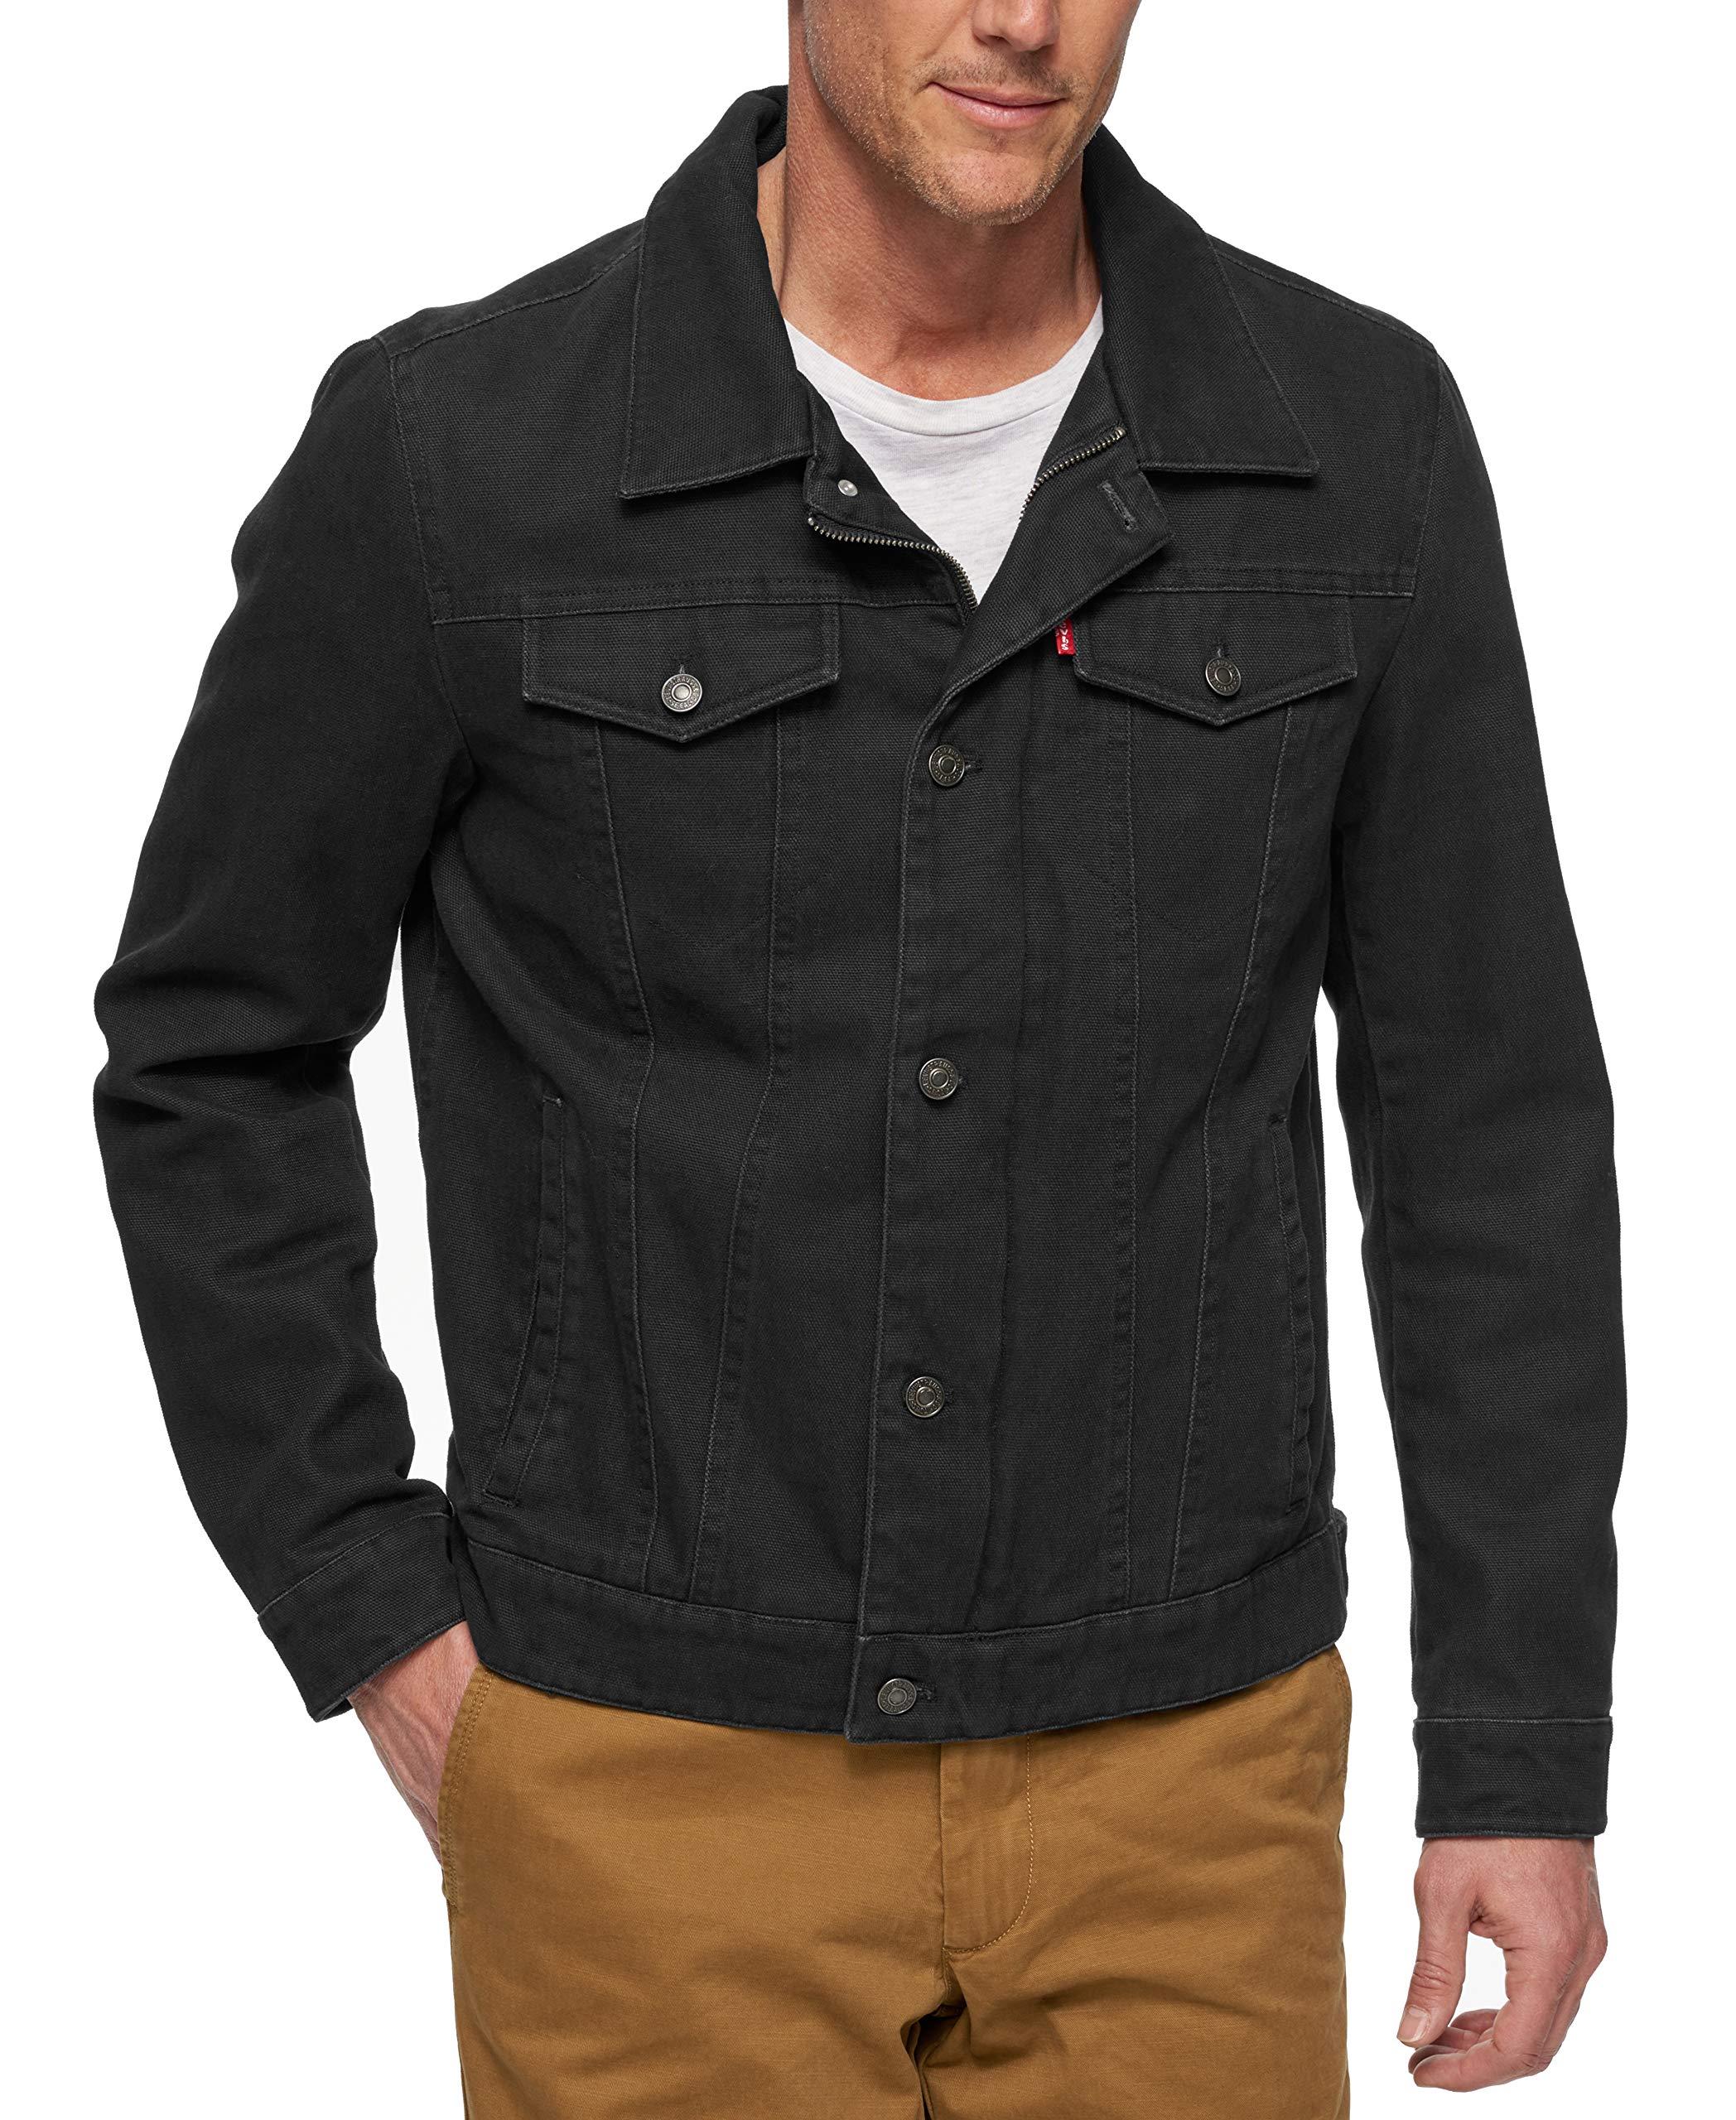 Levi's Men's Cotton Canvas Laydown Trucker Jacket, Black, XX-Large by Levi's